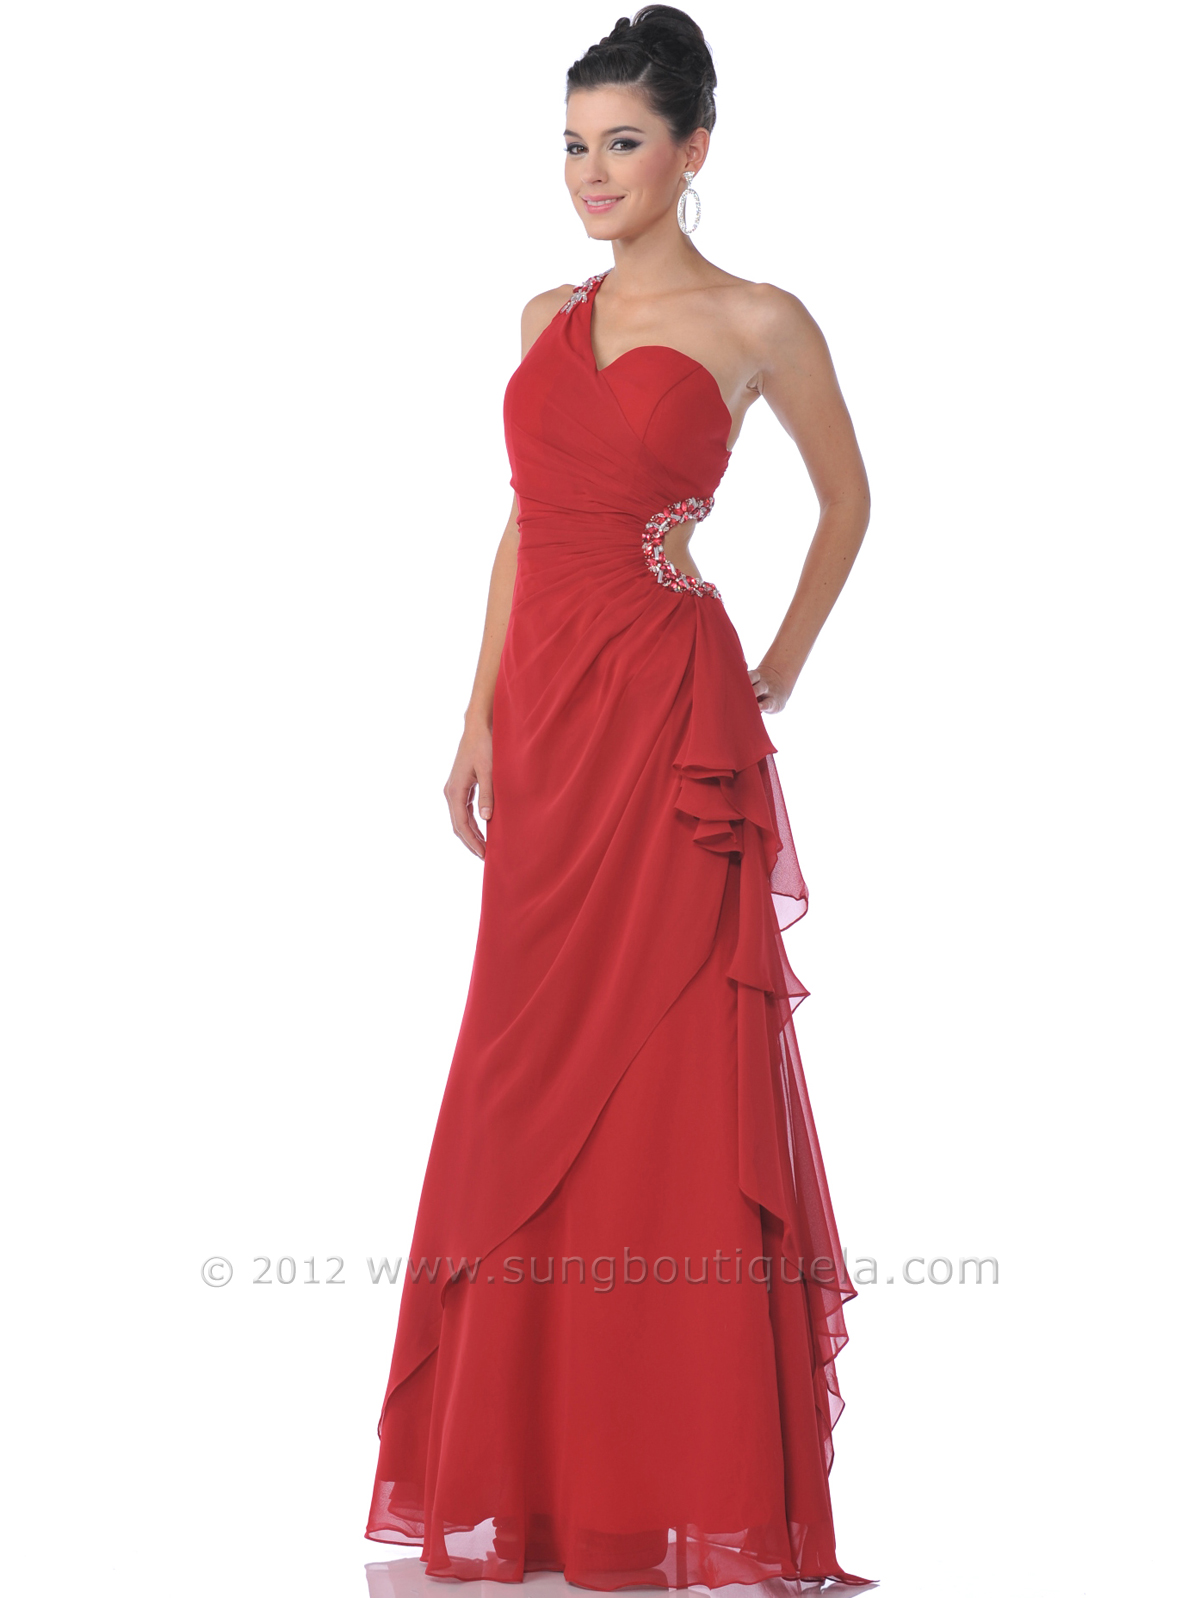 Rental Wedding Dresses Los Angeles Ca : Evening dresses rental los angeles prom stores